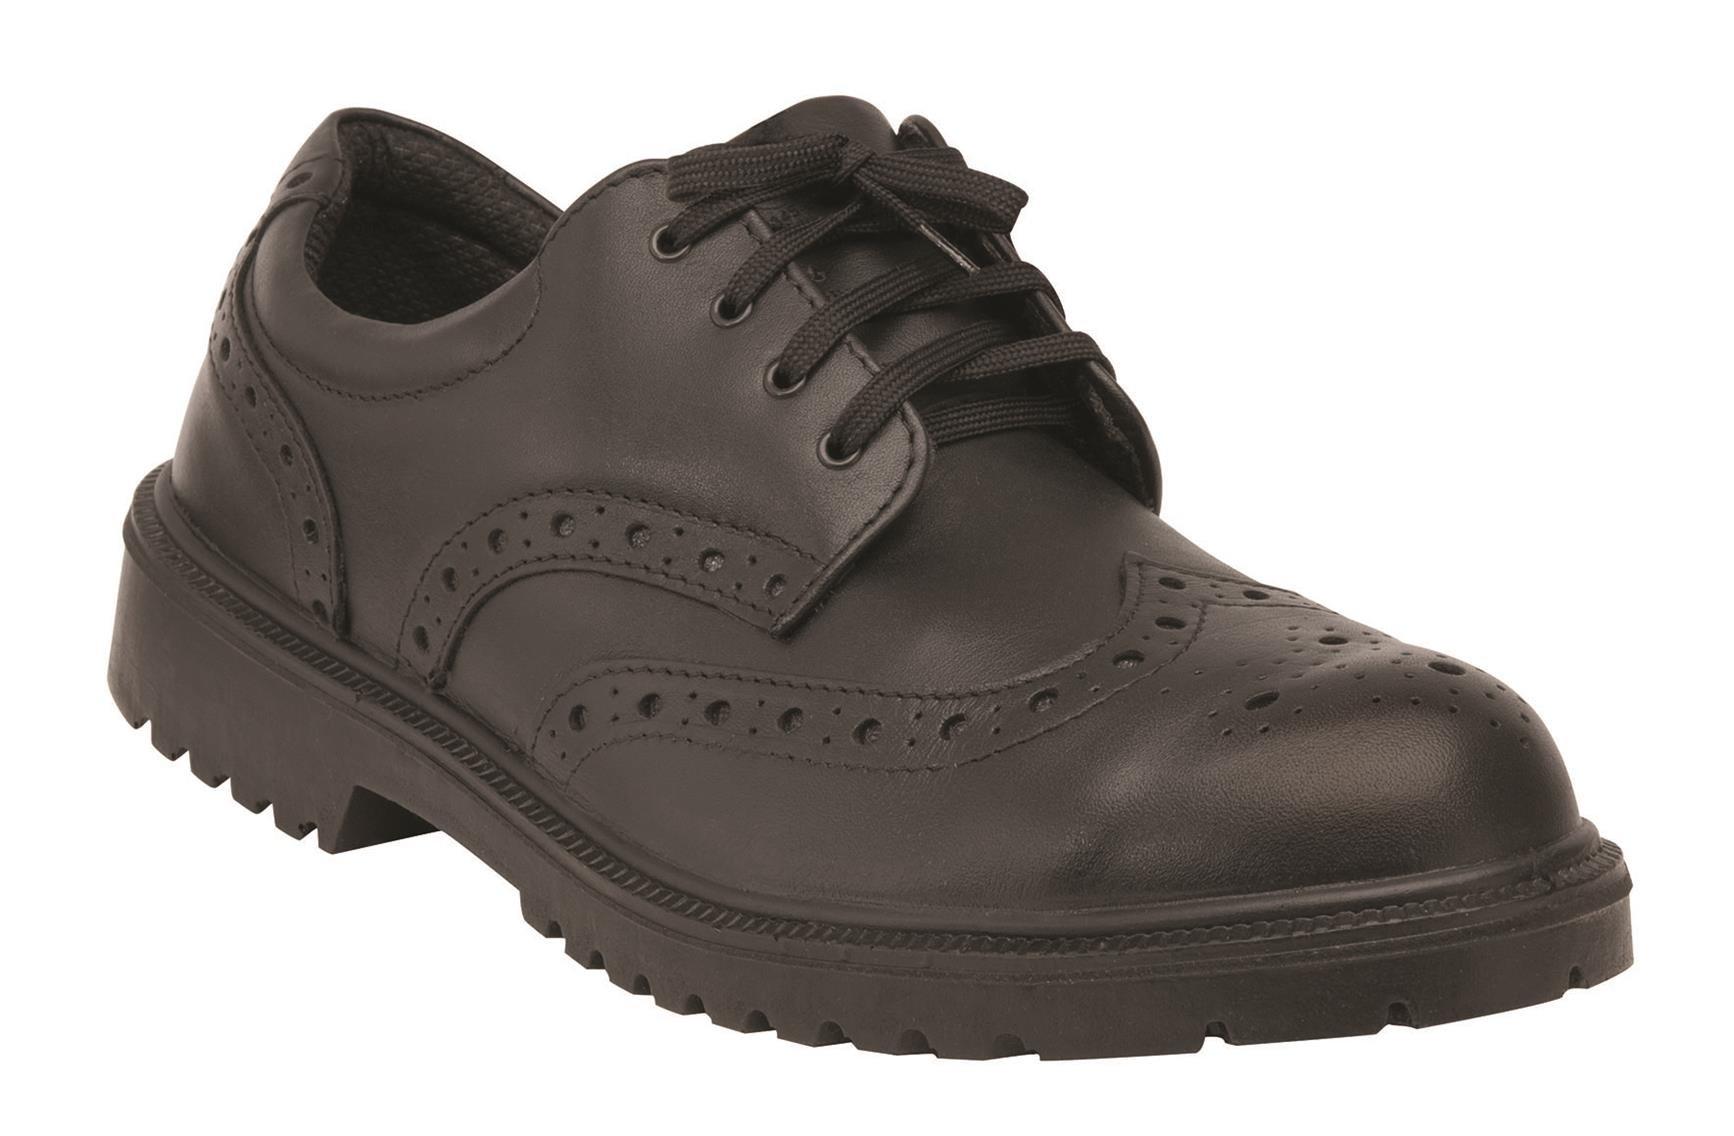 King's by Honeywell KEWT84 Steel Toe Executive WingTip, Size 6